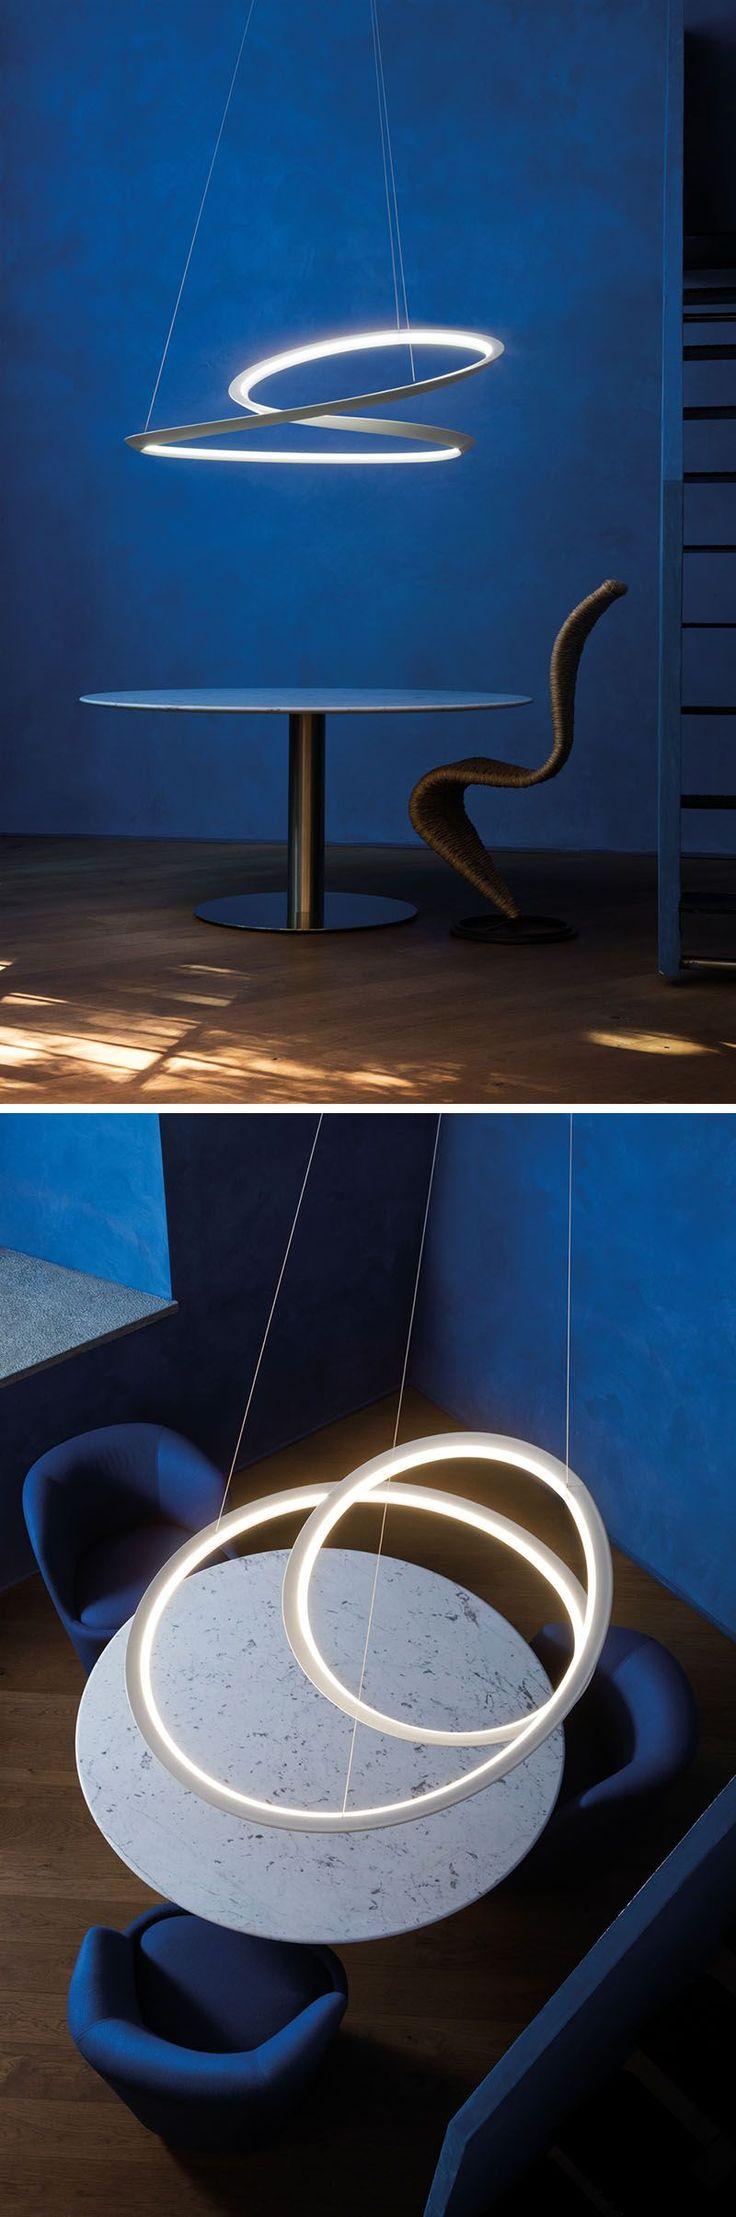 best 25+ led lights manufacturers ideas on pinterest | led